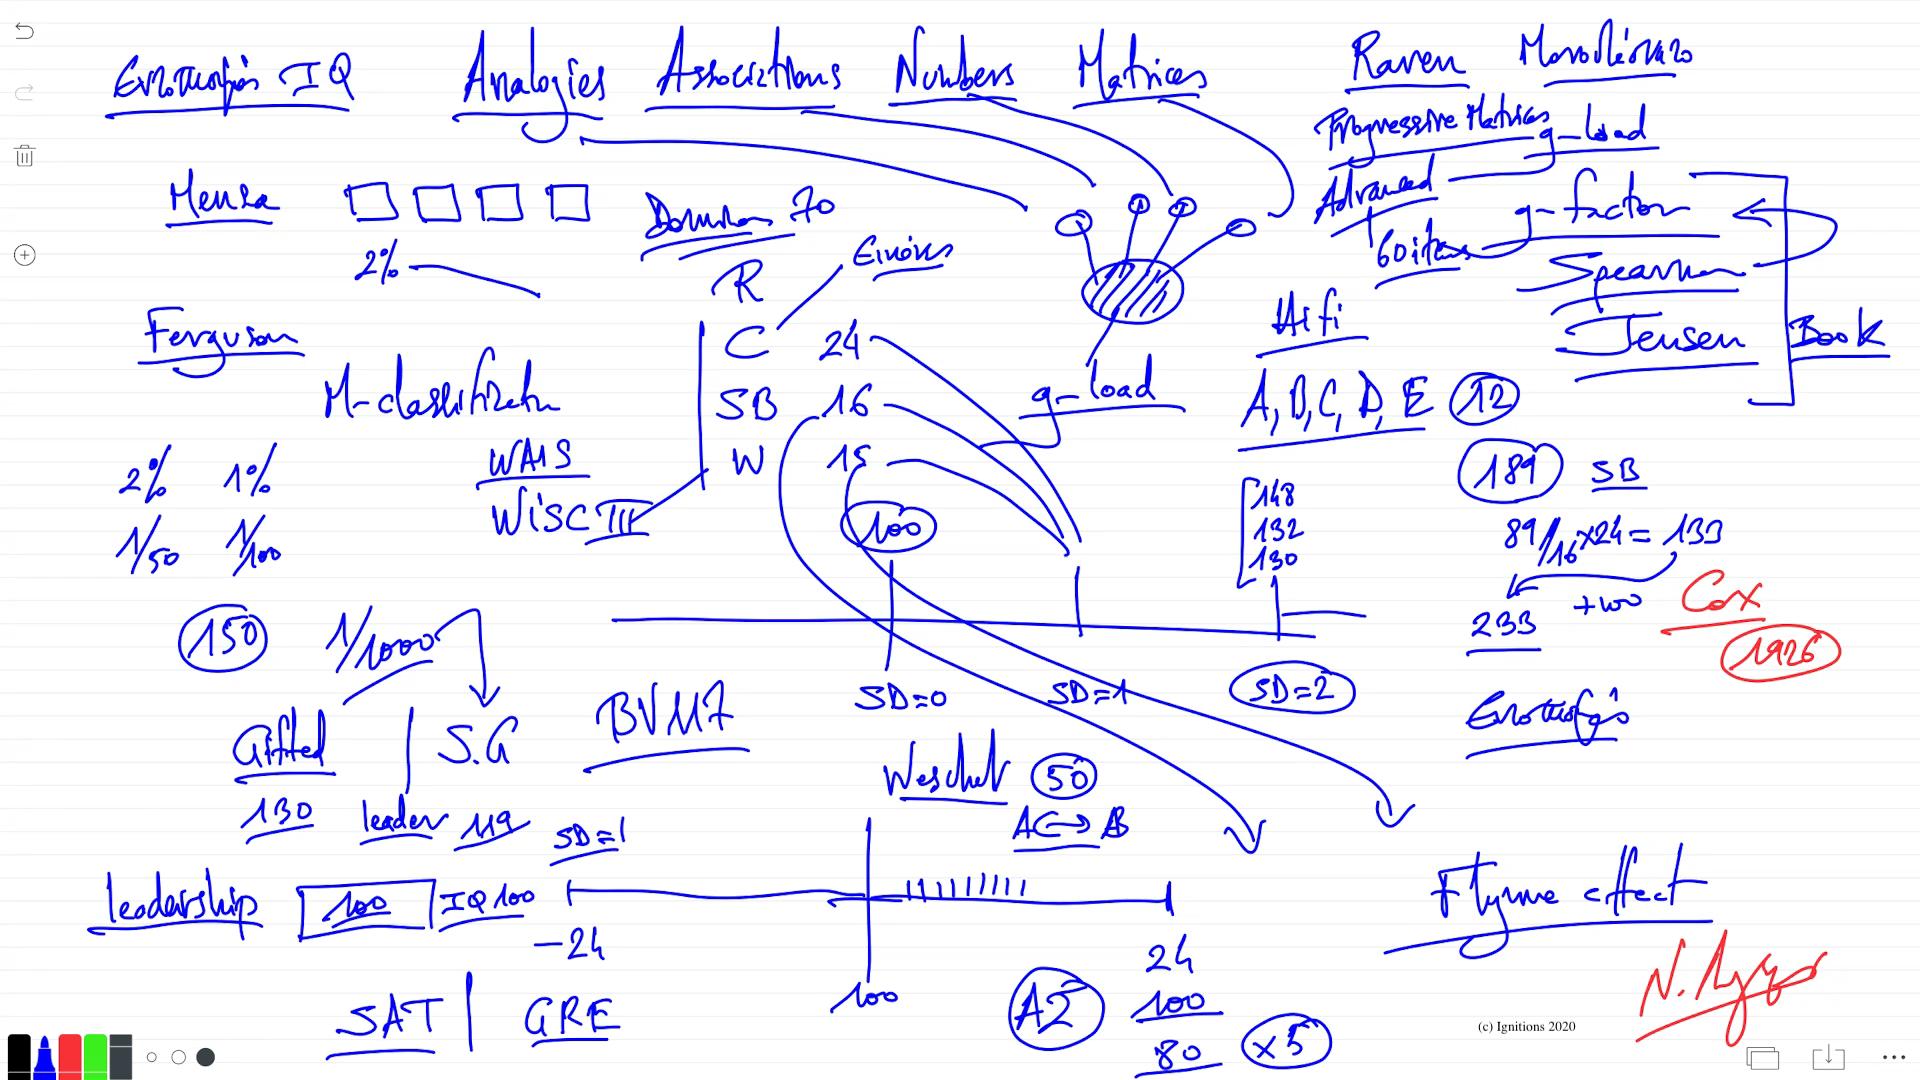 56448 - e-Μάθημα:IQ, studies, applications. (Dessin)